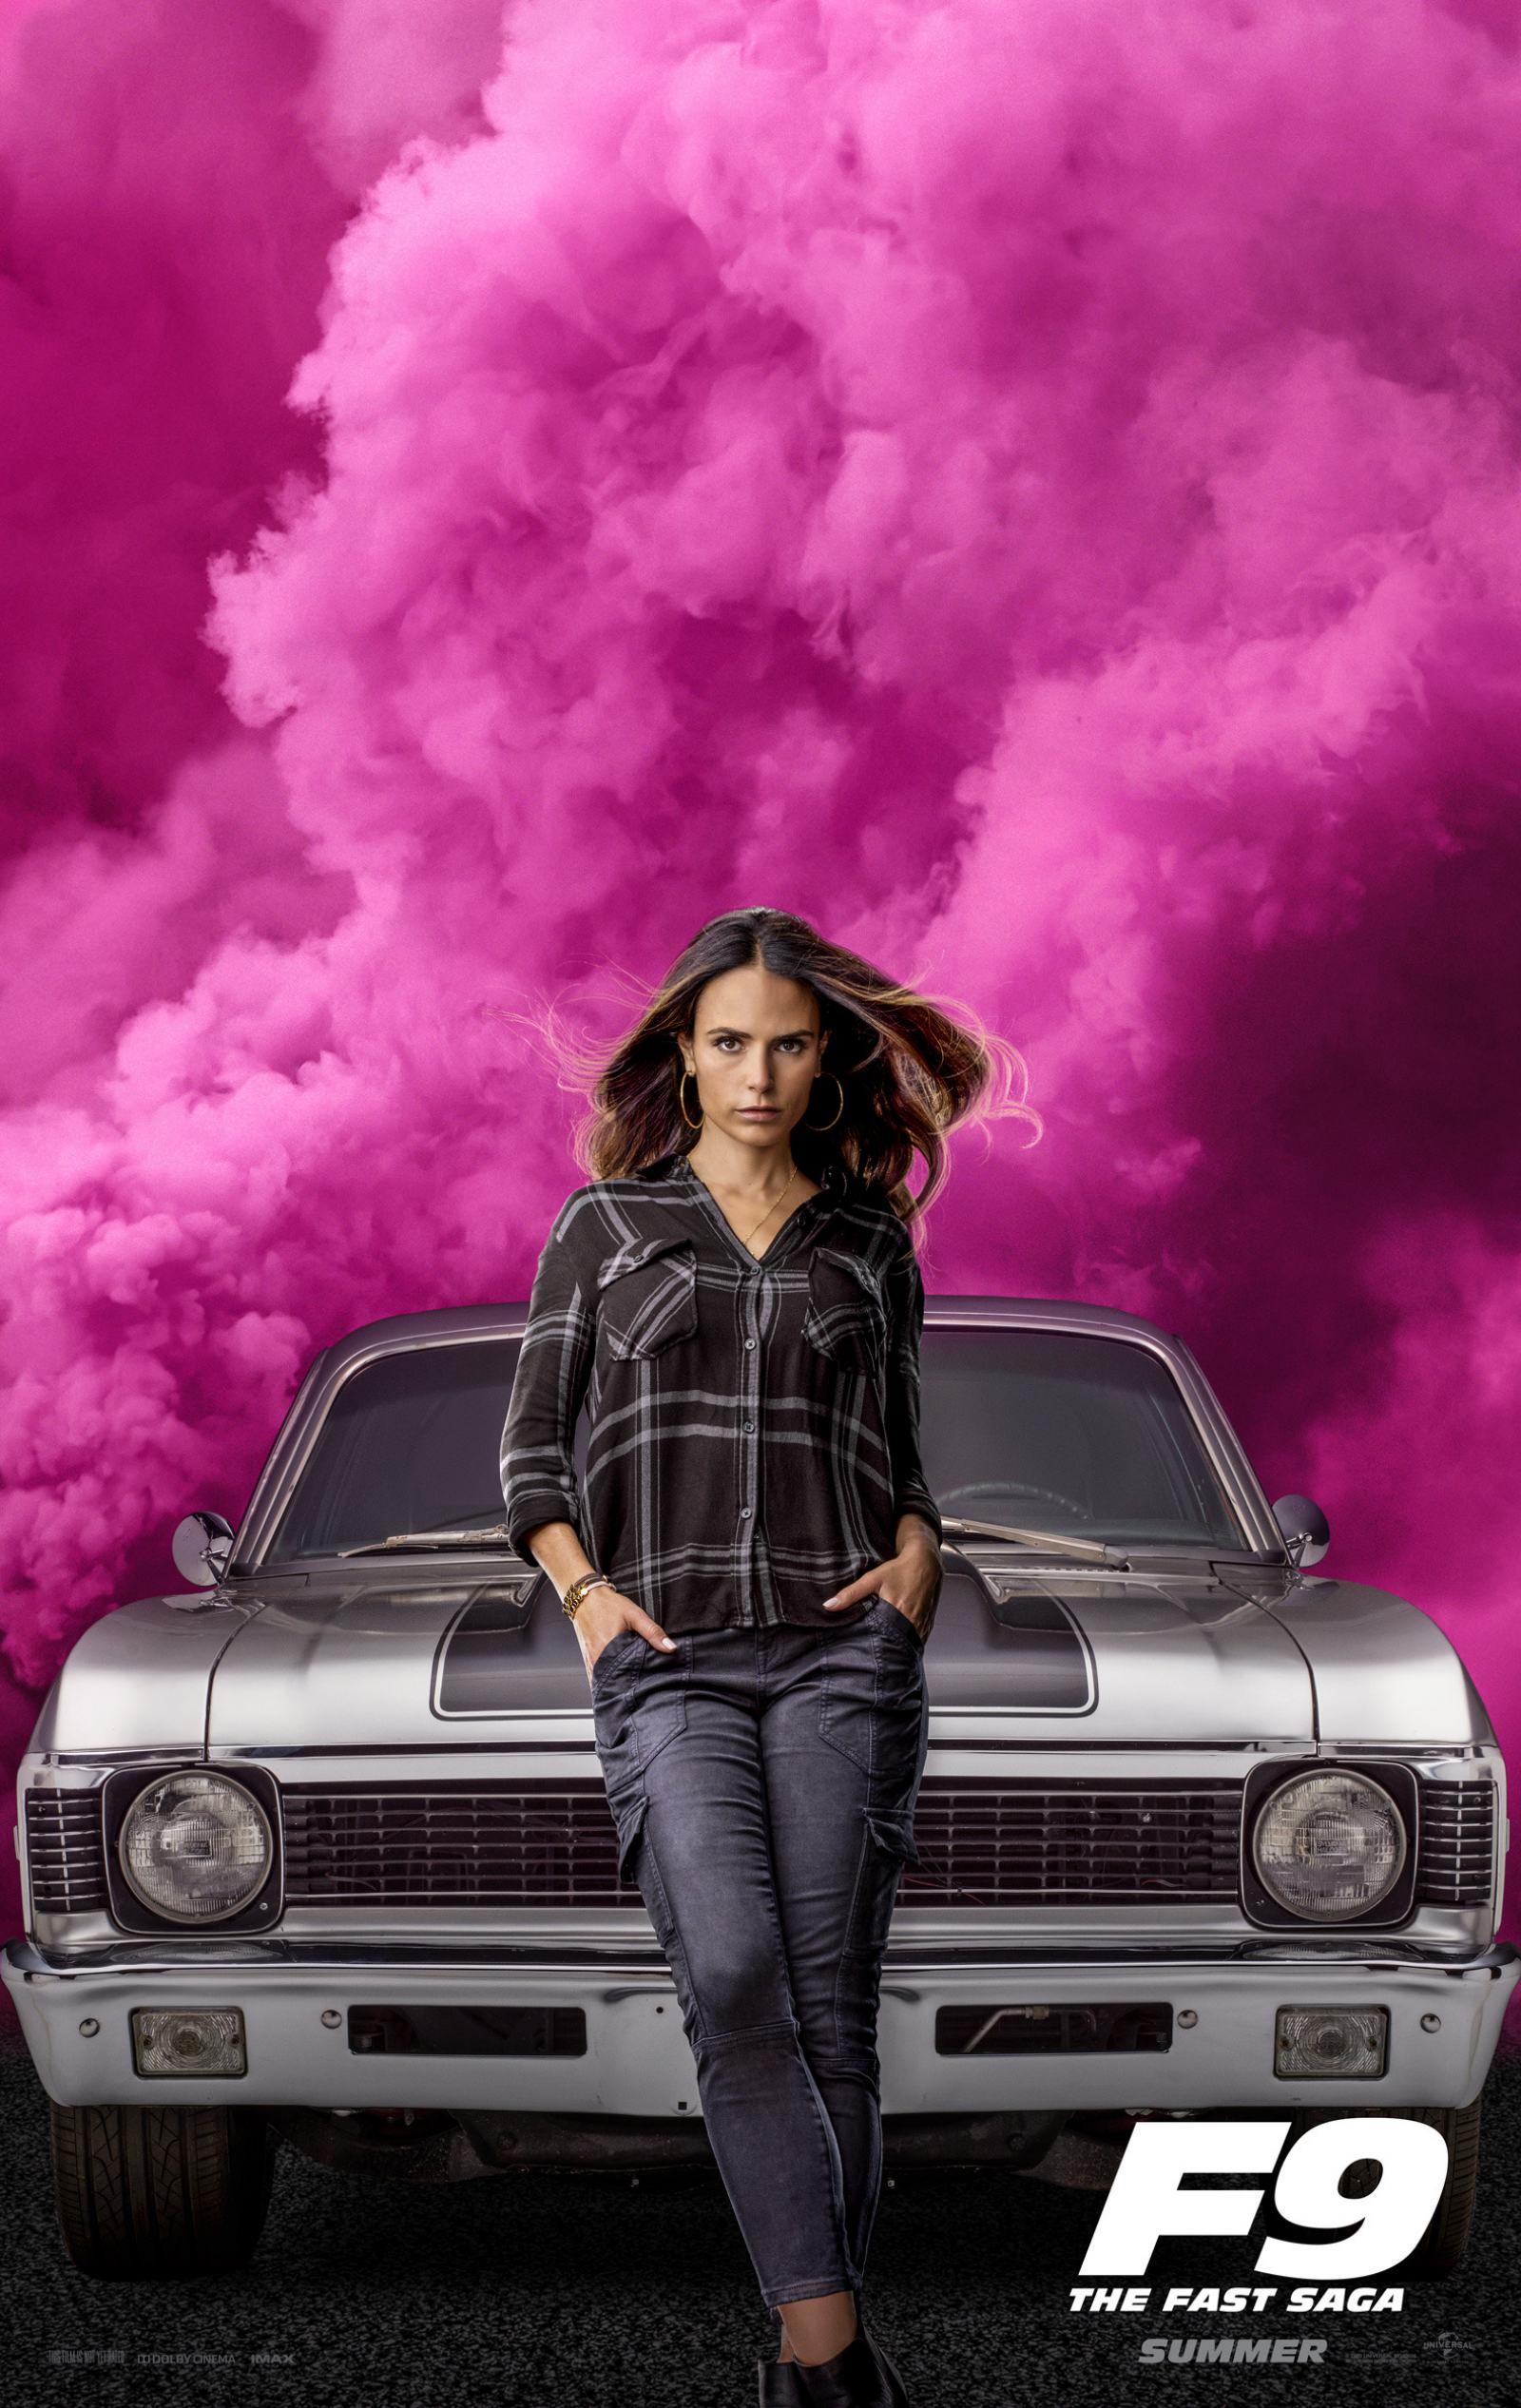 F9: The Fast Saga Poster #4